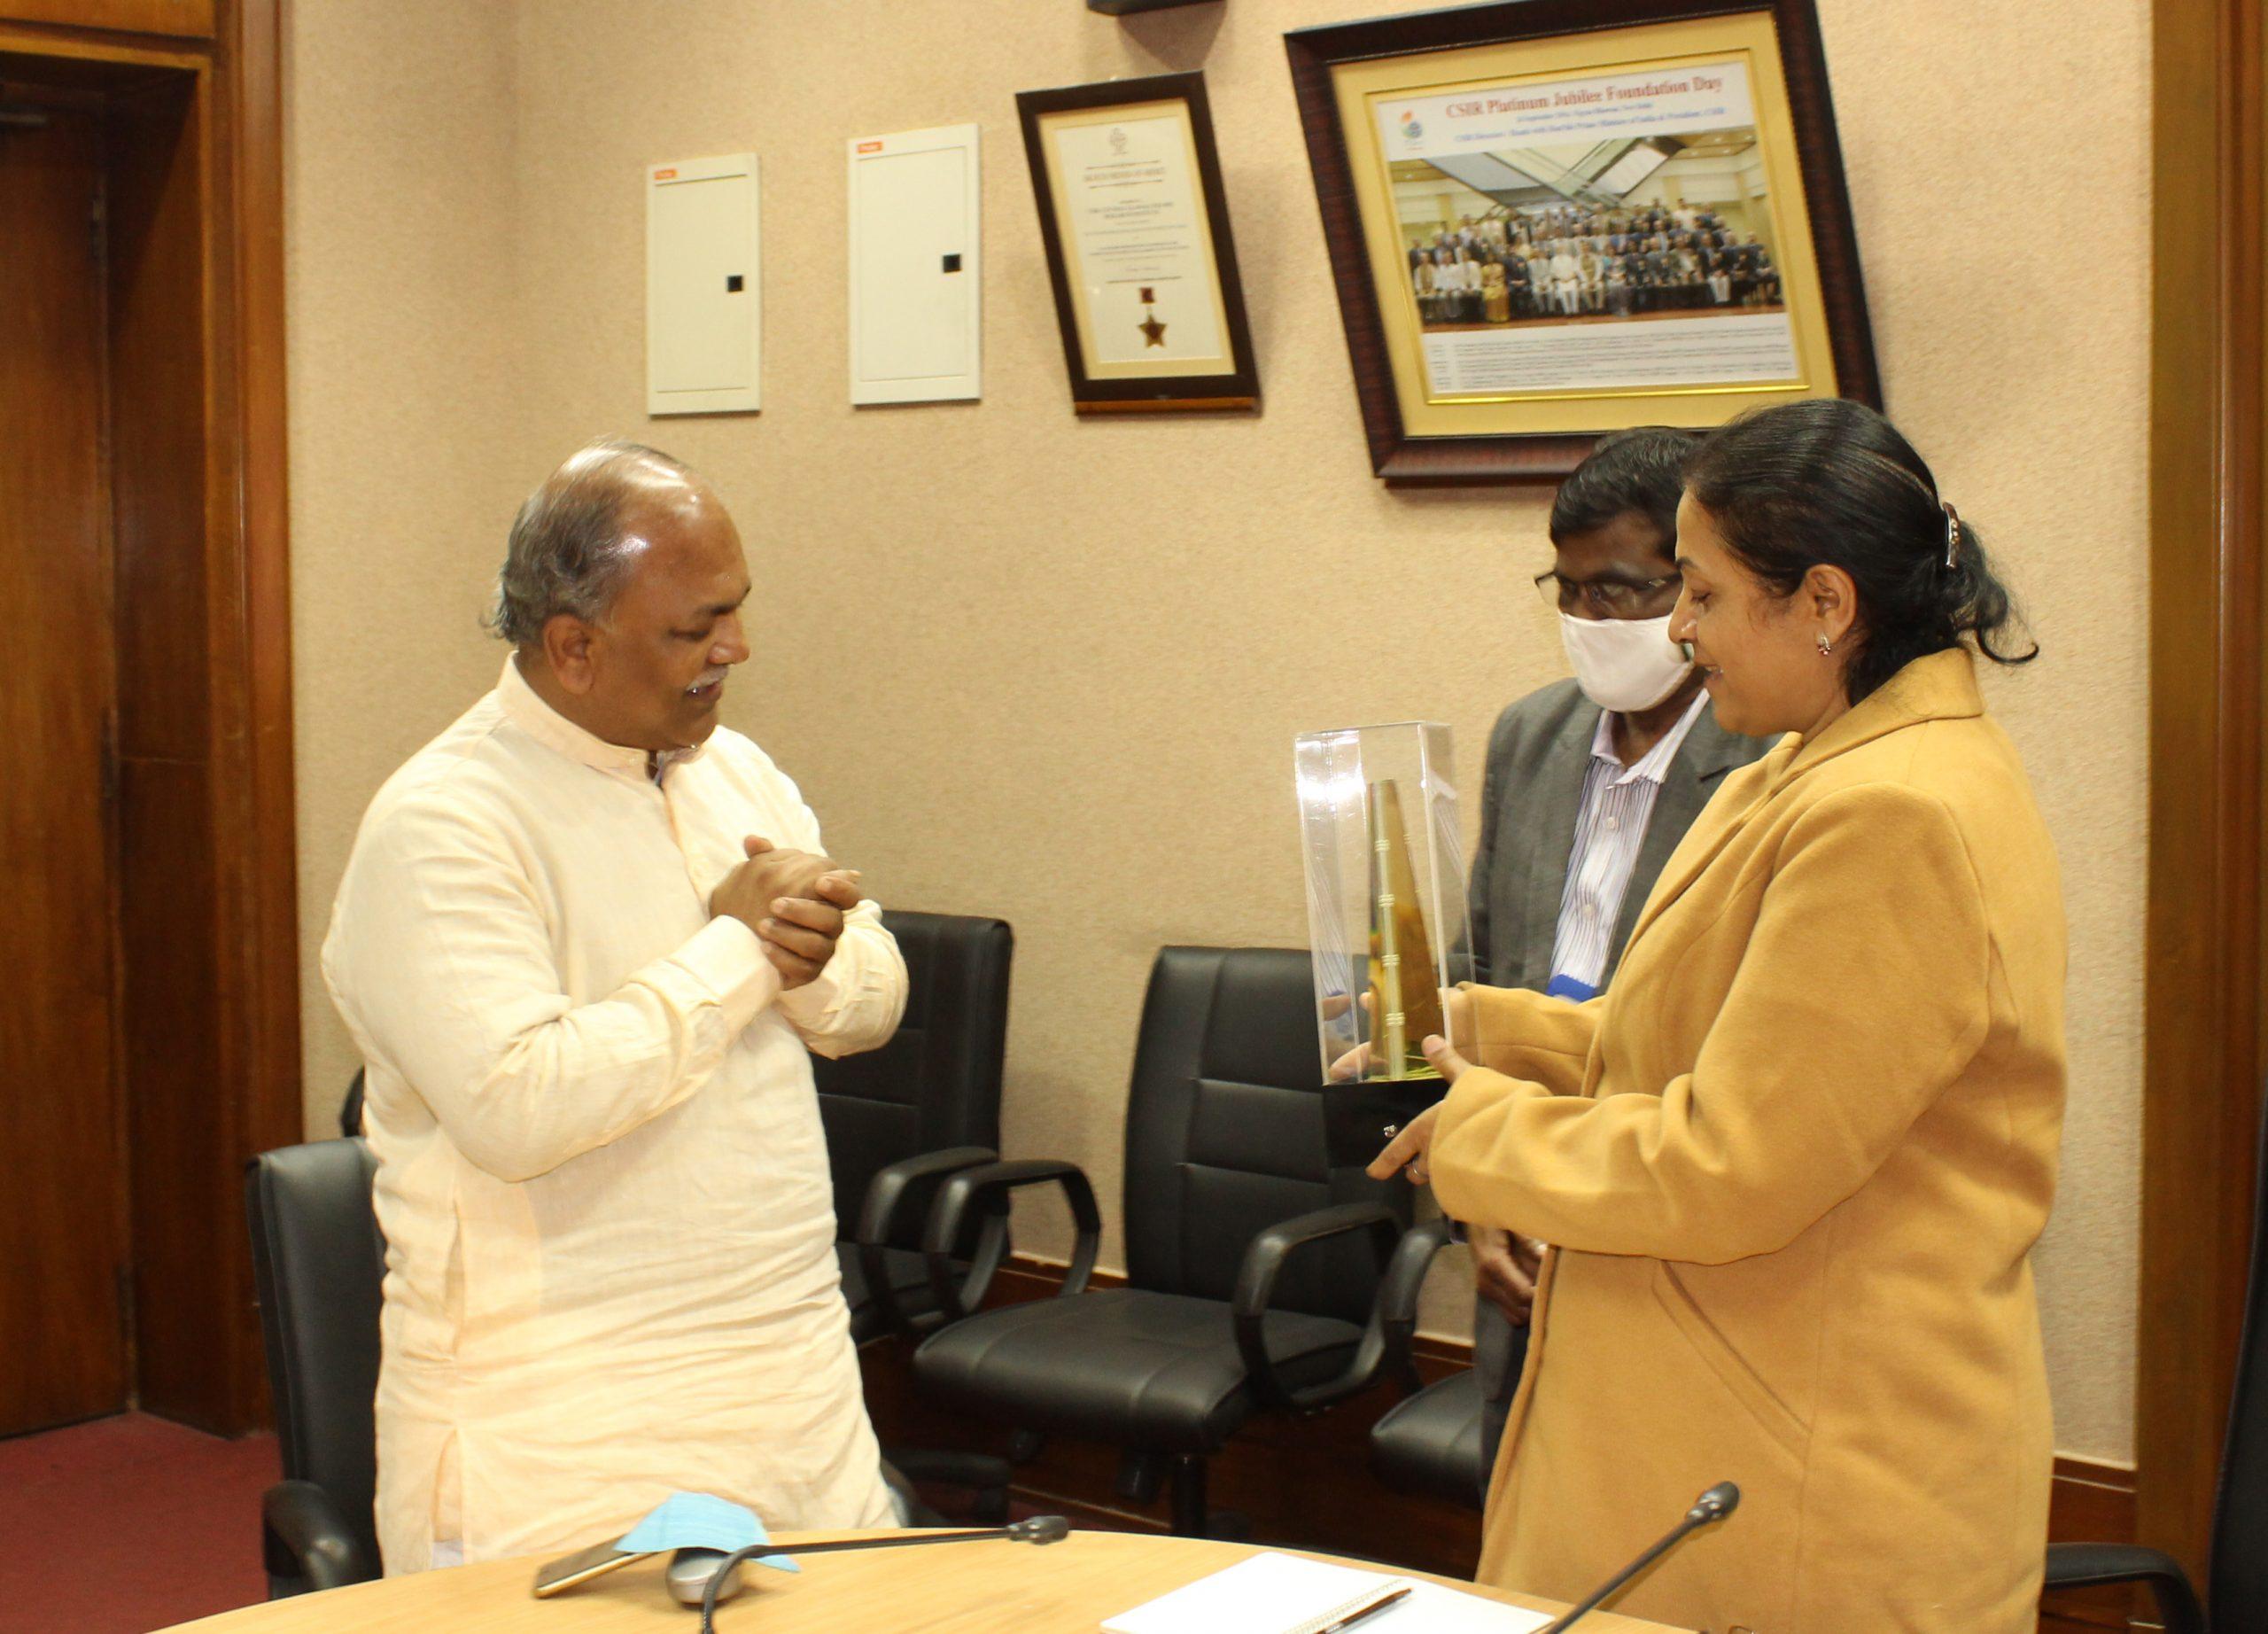 Felicitation of Shri Jayant Sahasrabudhe, National Organising Secretary, VIBHA